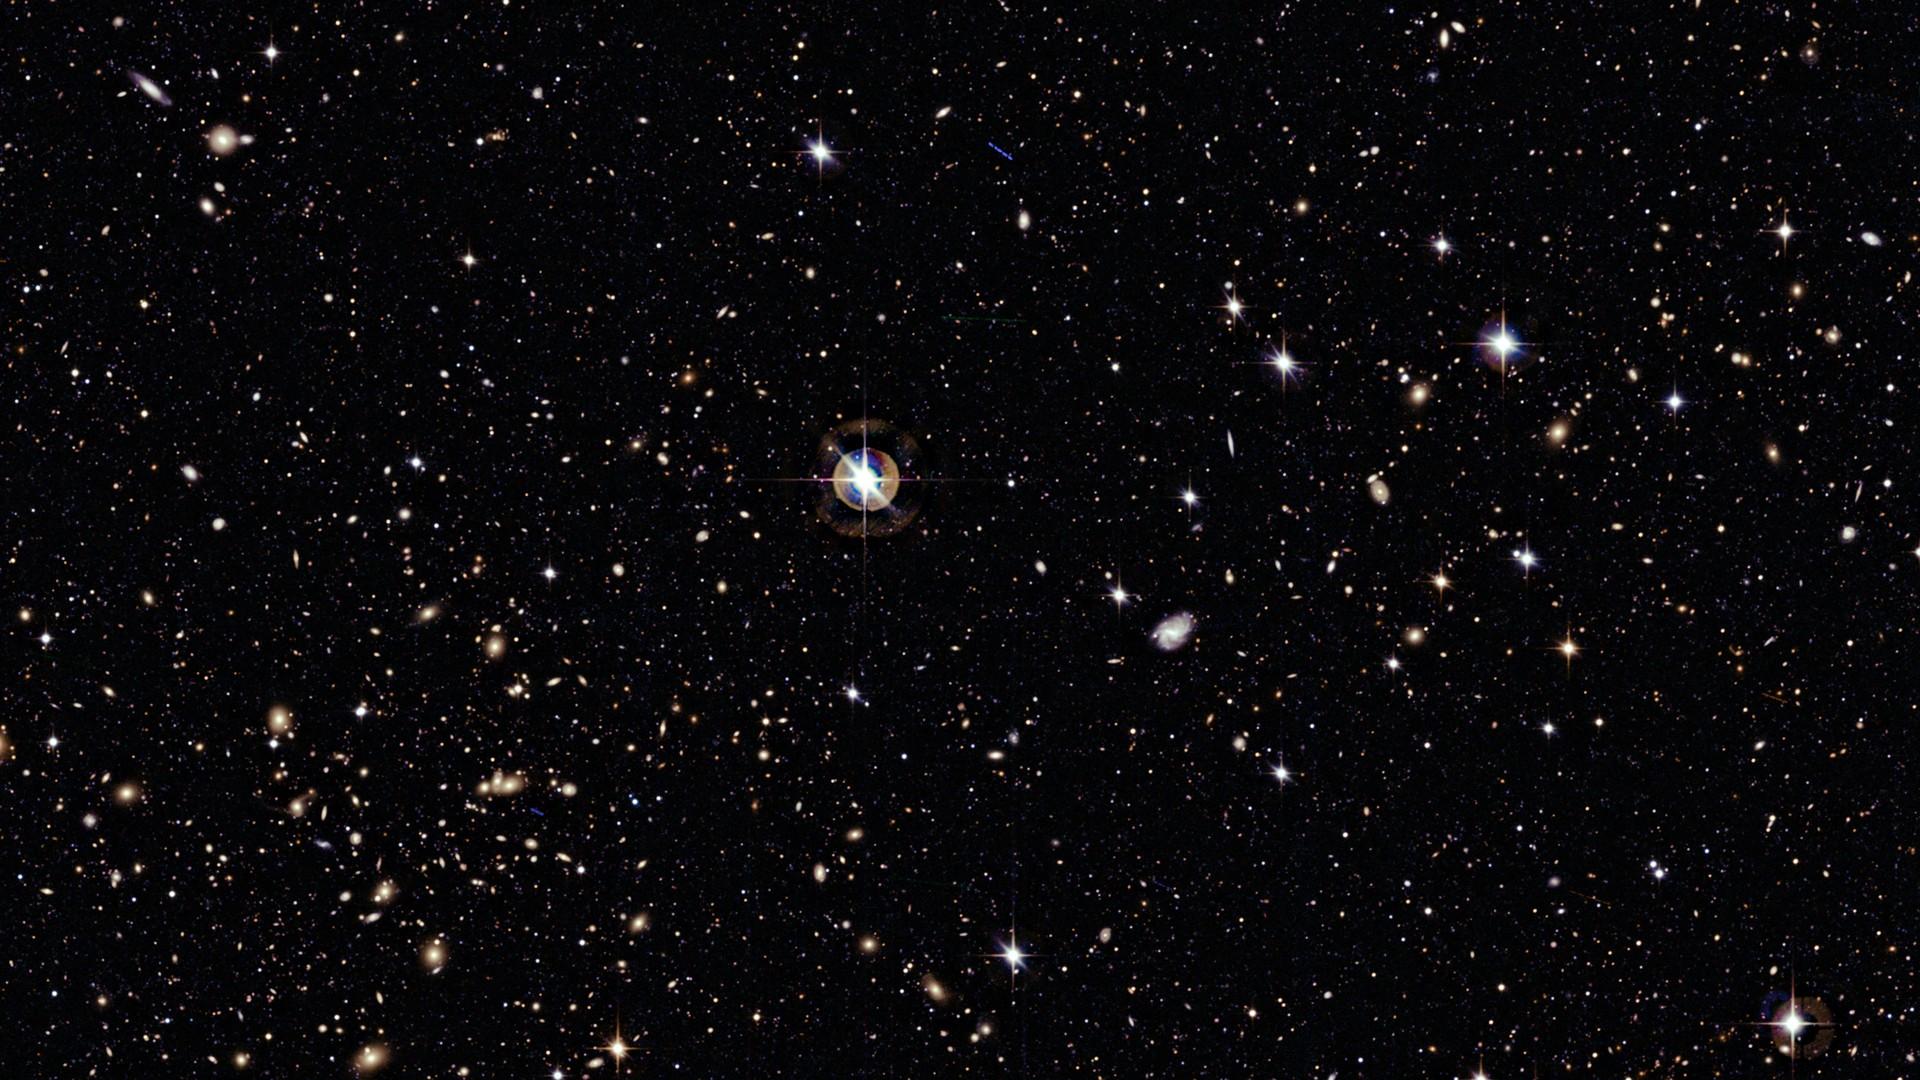 Hd Outer Space Wallpaper: HD Outer Space Wallpapers